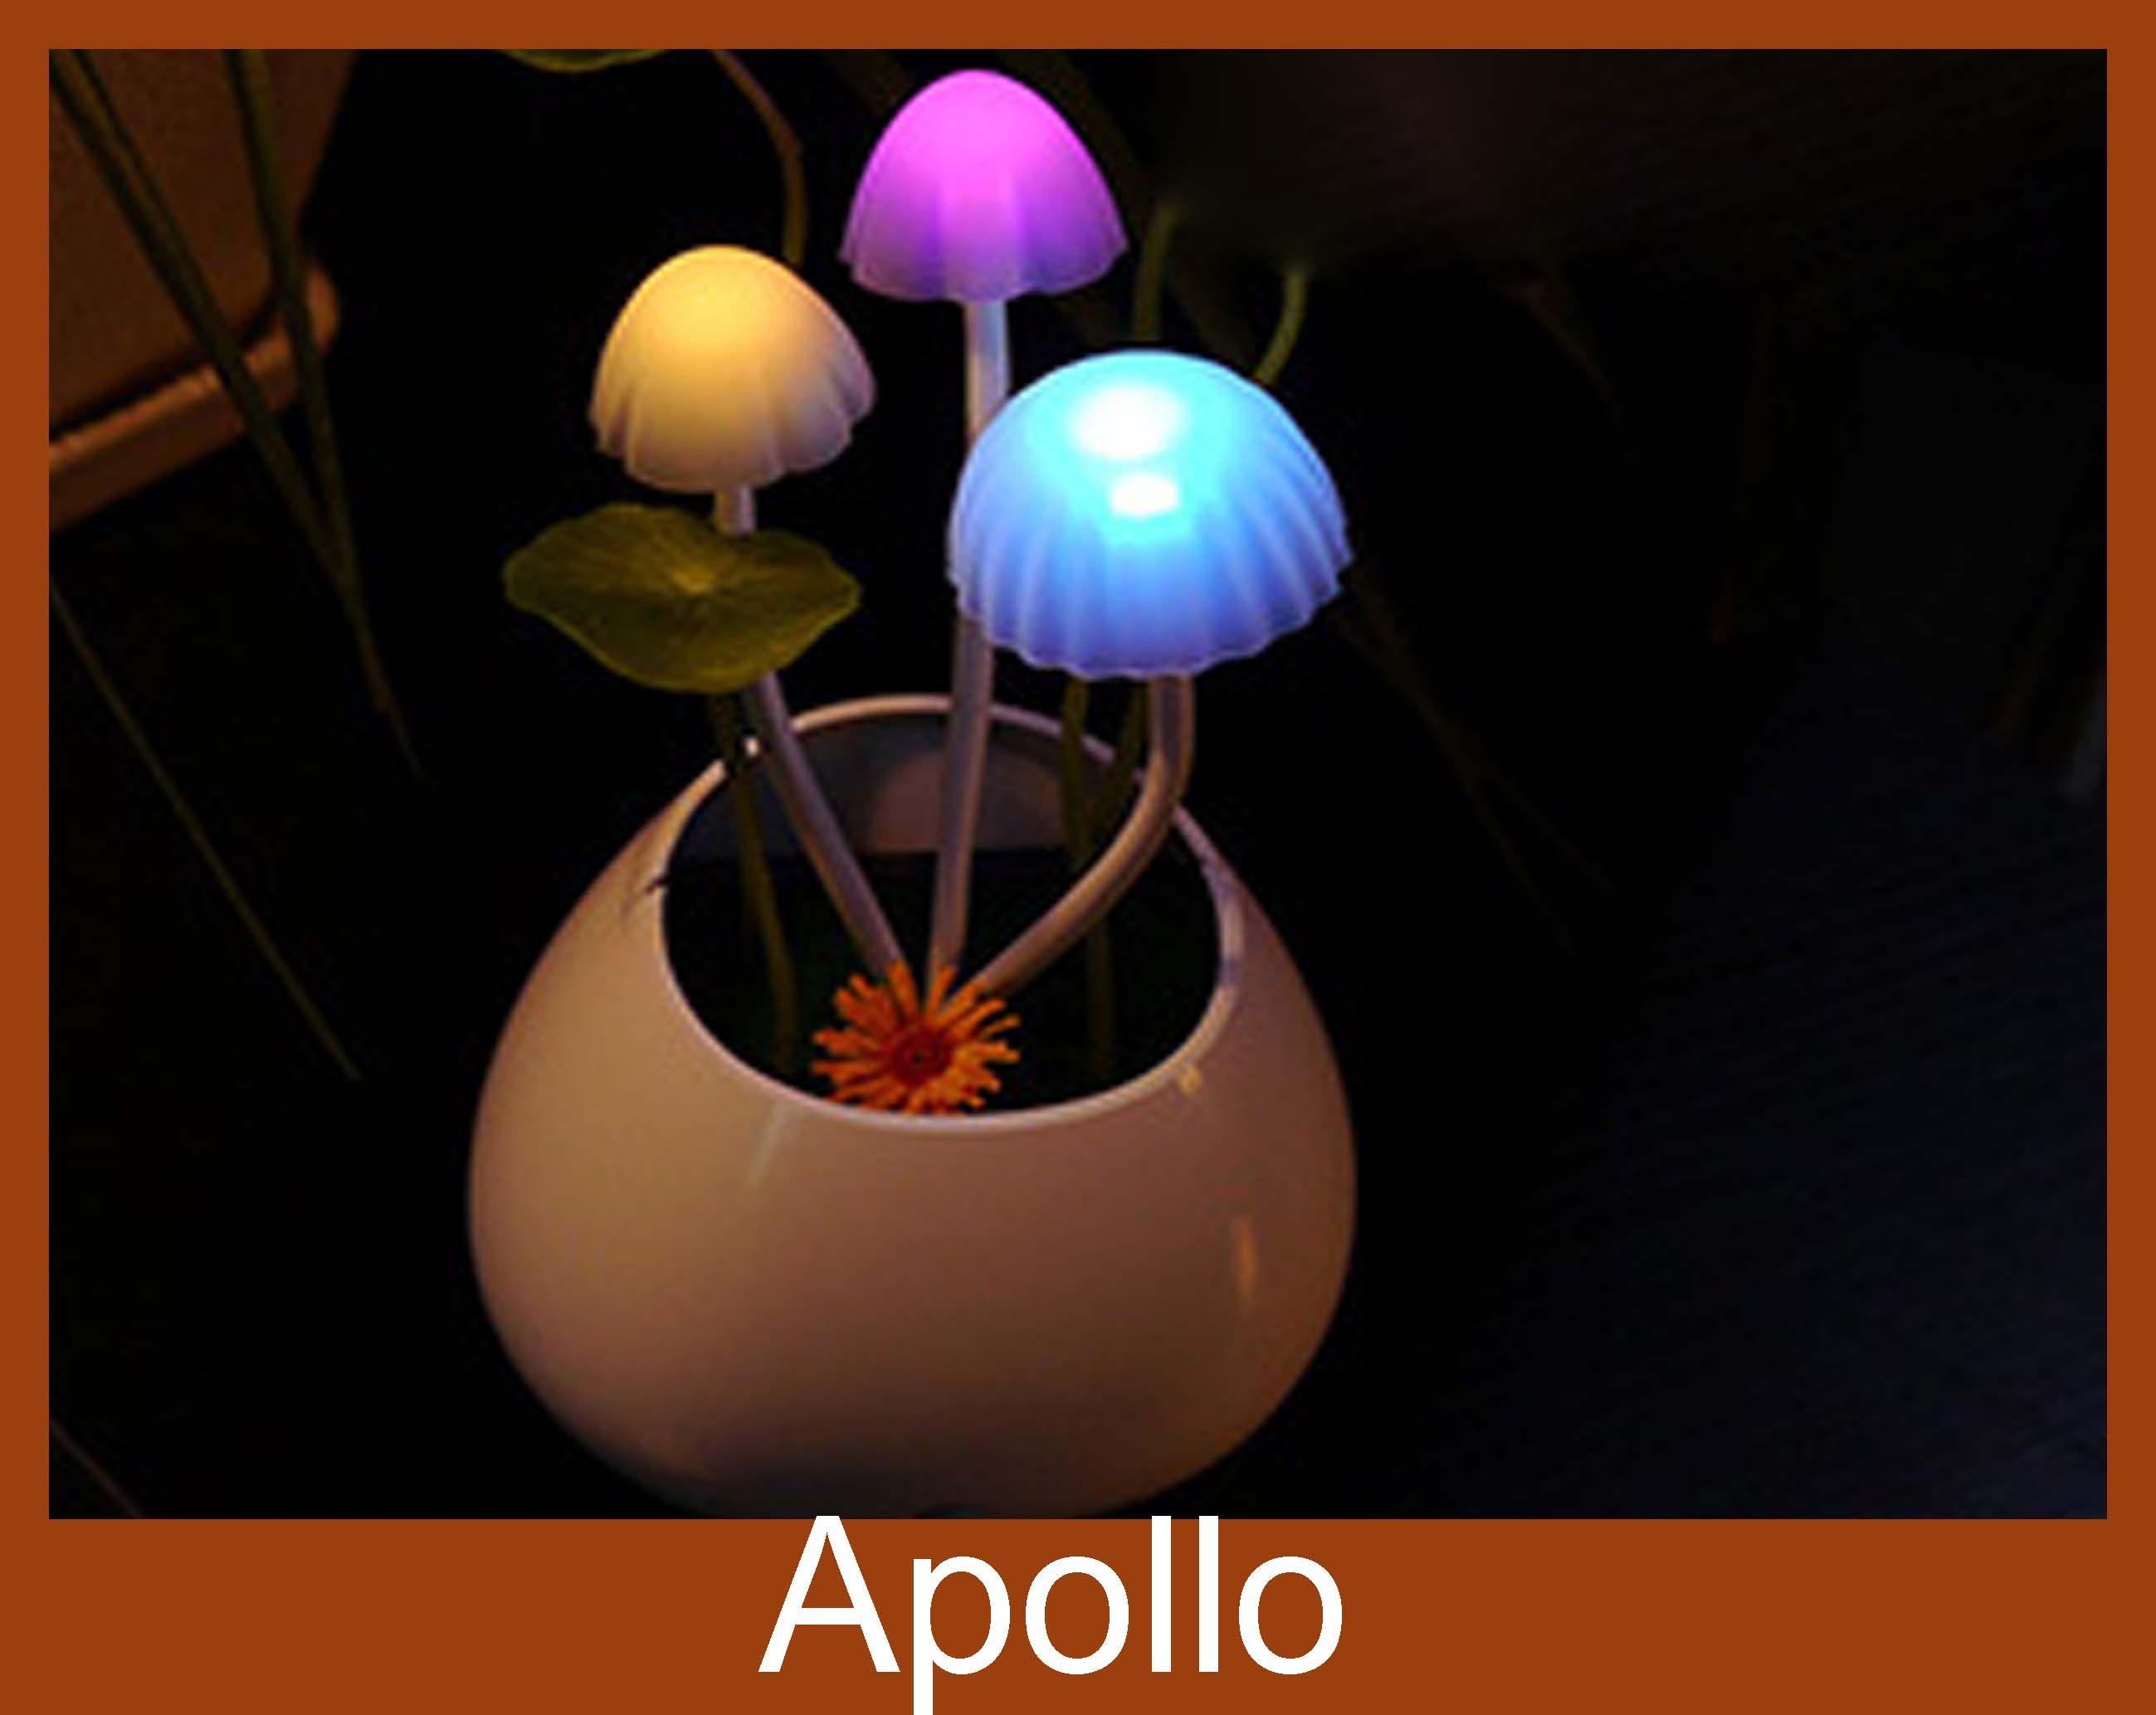 2018 smart led night light avatar mini mushroom light sensor lamp